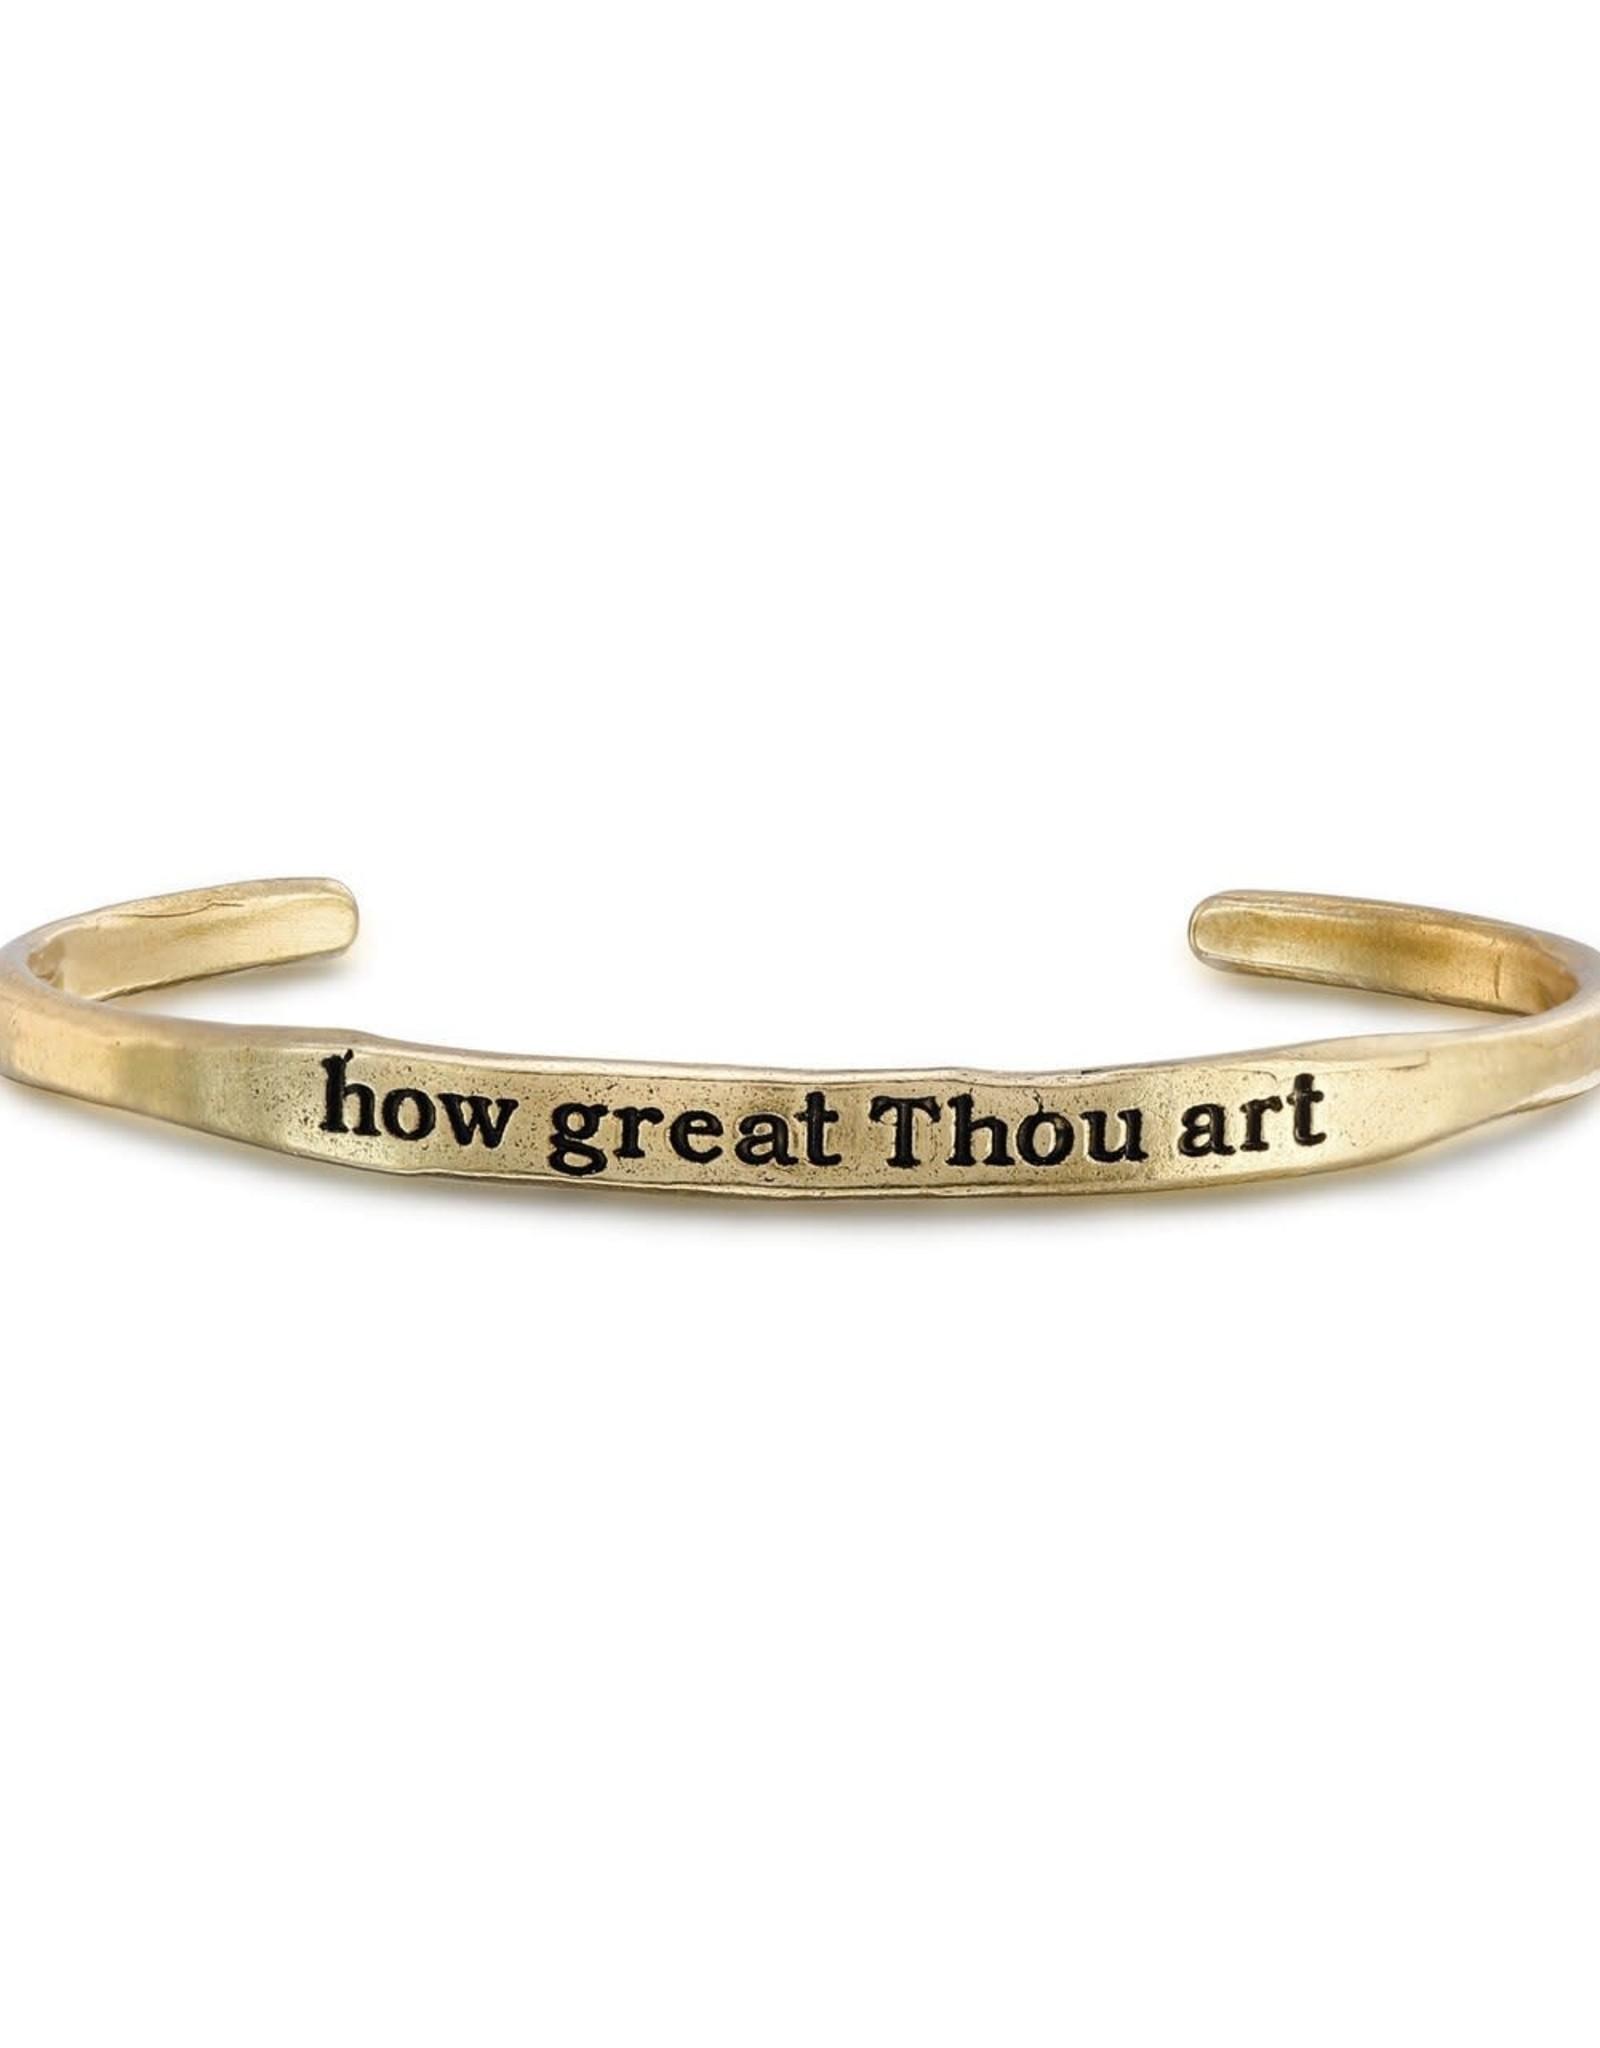 Demdaco Inspired Bracelet